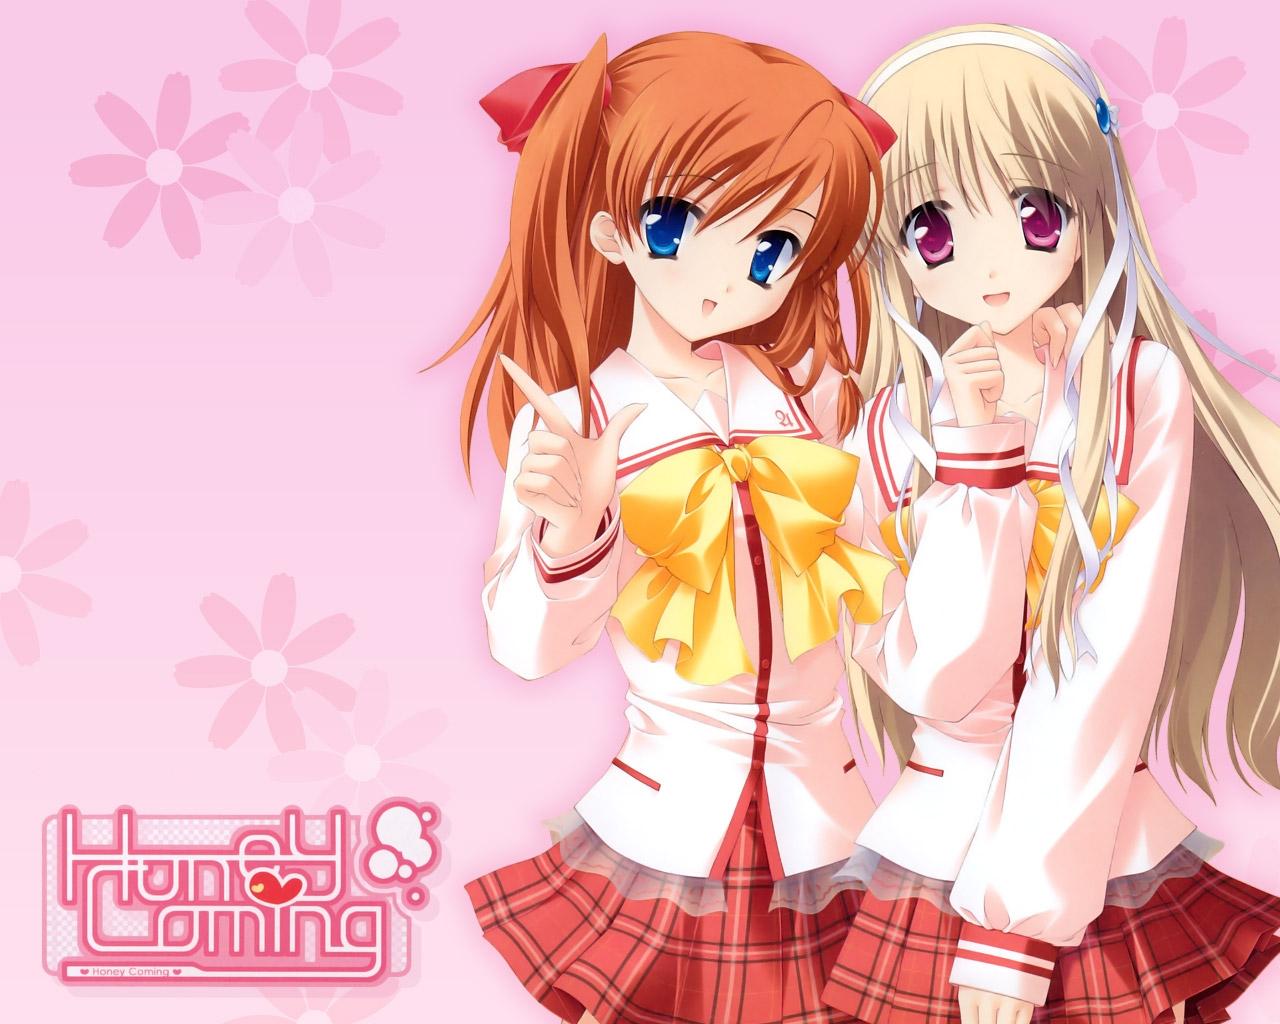 Ilustrasi Anime Gambar Kartun Berwarna Merah Muda Imut Gadis Sikap Mangaka Rok Madu Datang Asahi Kamijou